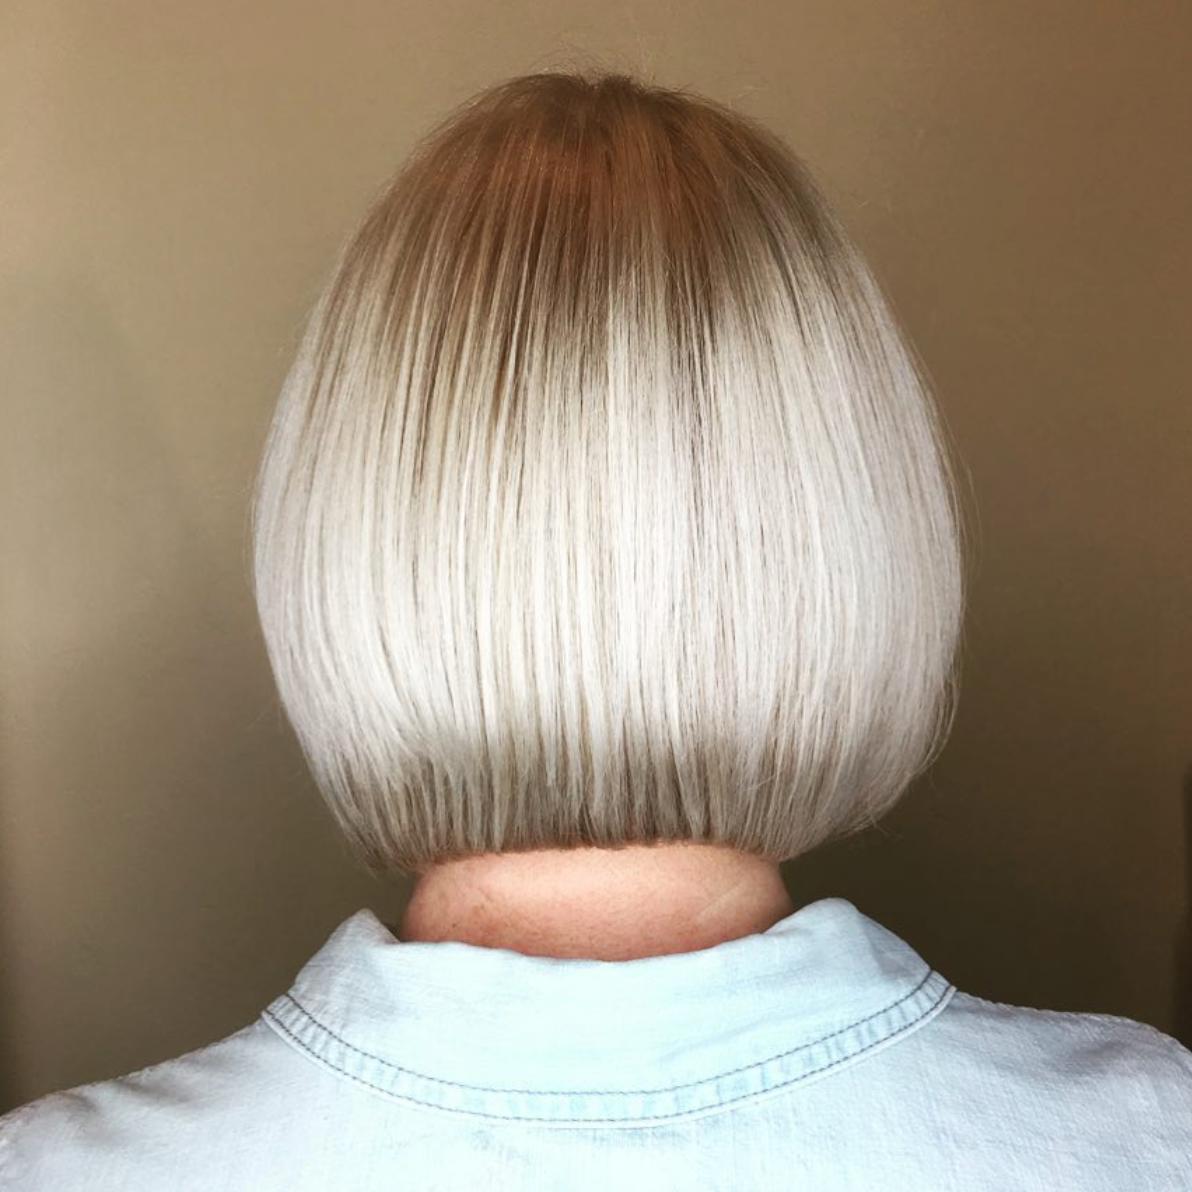 Haircut Hair Style Hair Color Talmadge Hickman Master Hair Stylist Chelsie Perkins Colorist Owners Salon Bella Whidbey Langley Haircut Hair Color